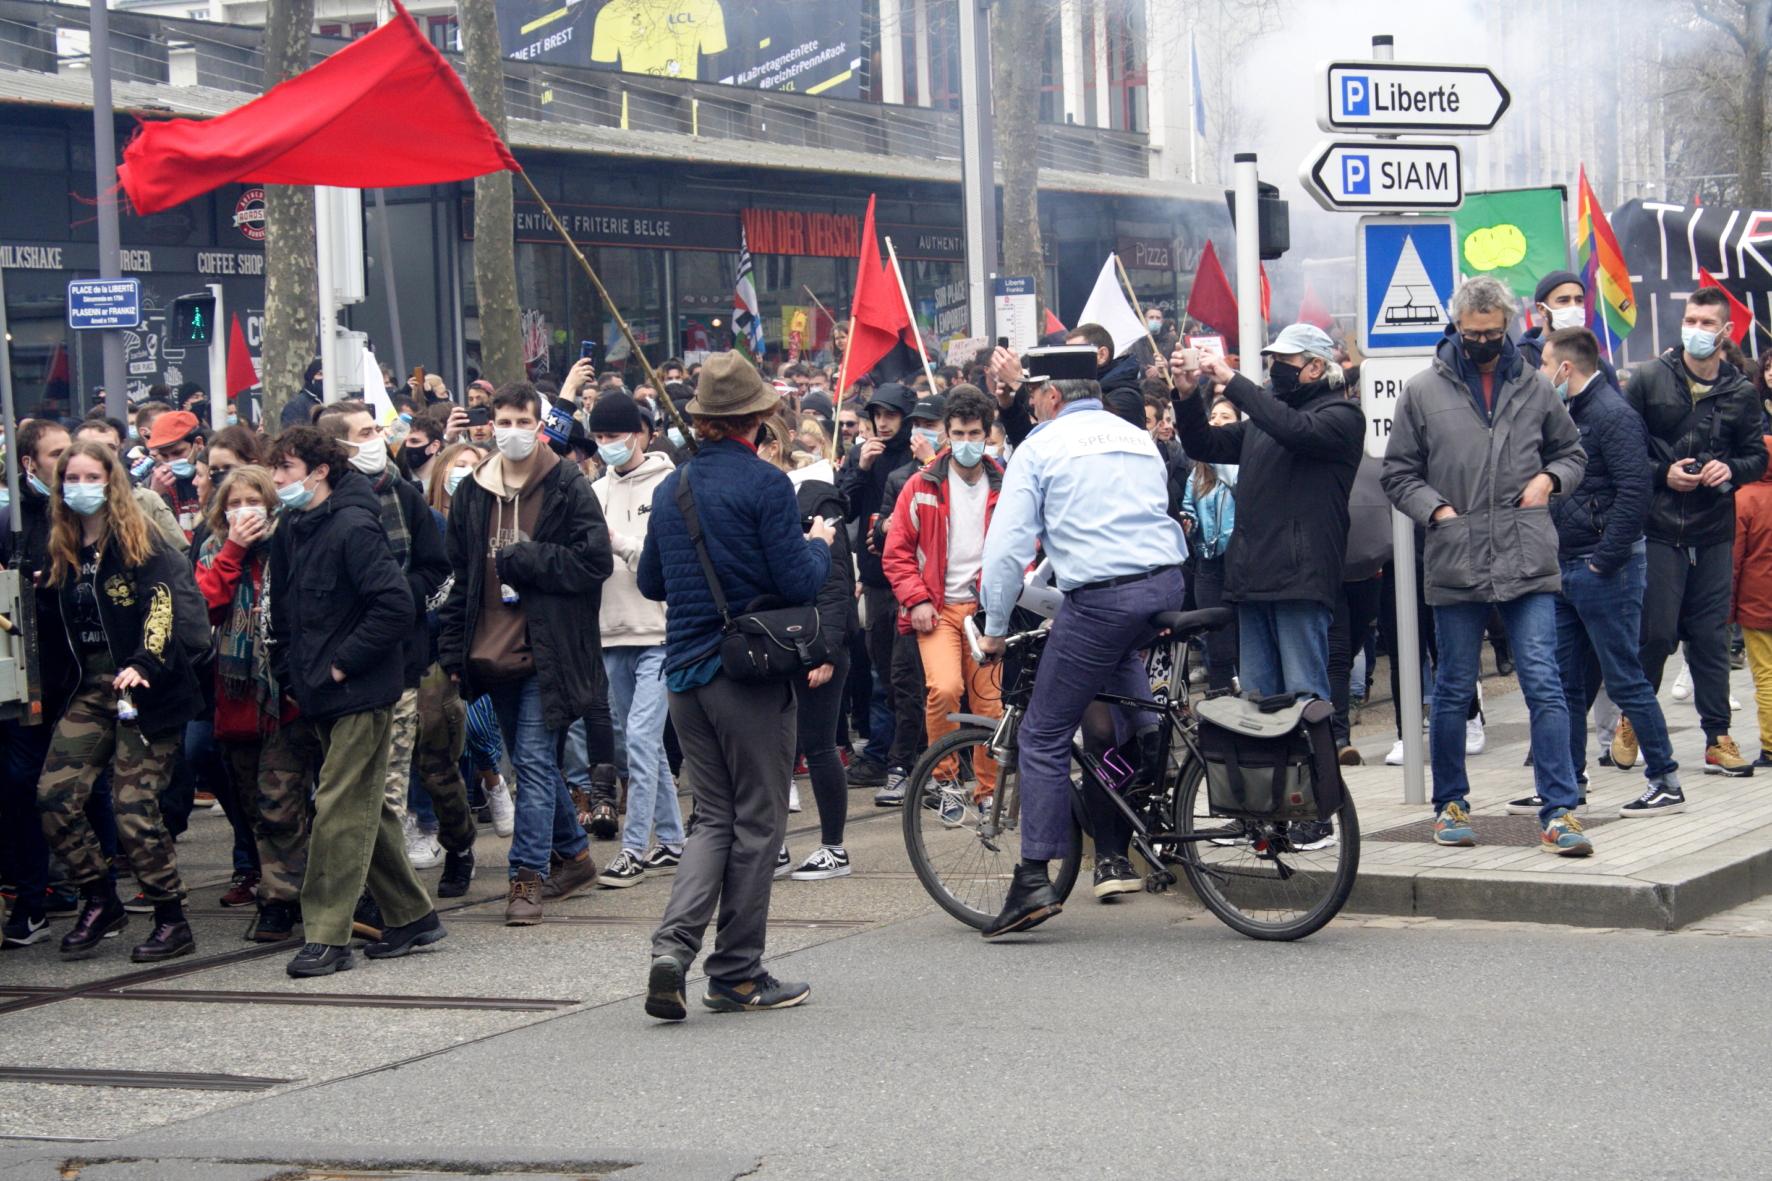 Manif-culture-Brest-20-03-21-148